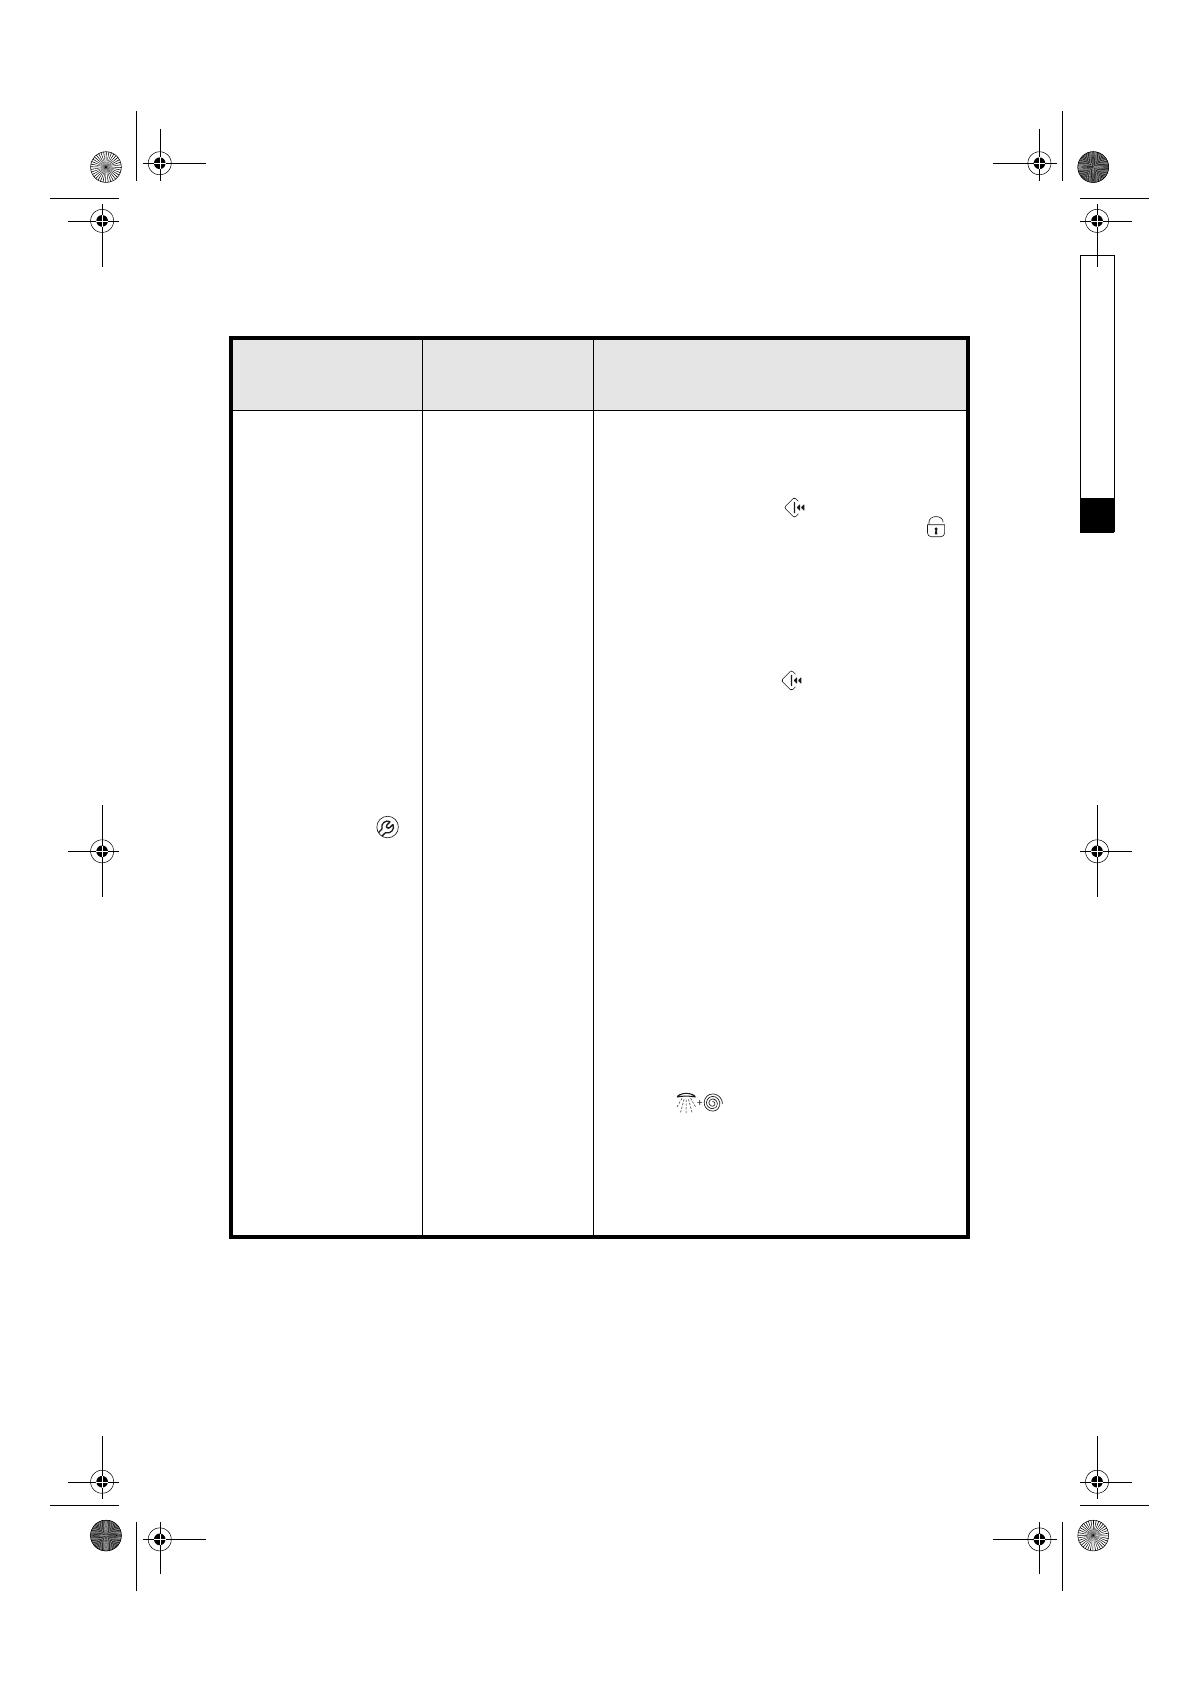 handleiding whirlpool awe 6728 (pagina 14 van 18) (français)